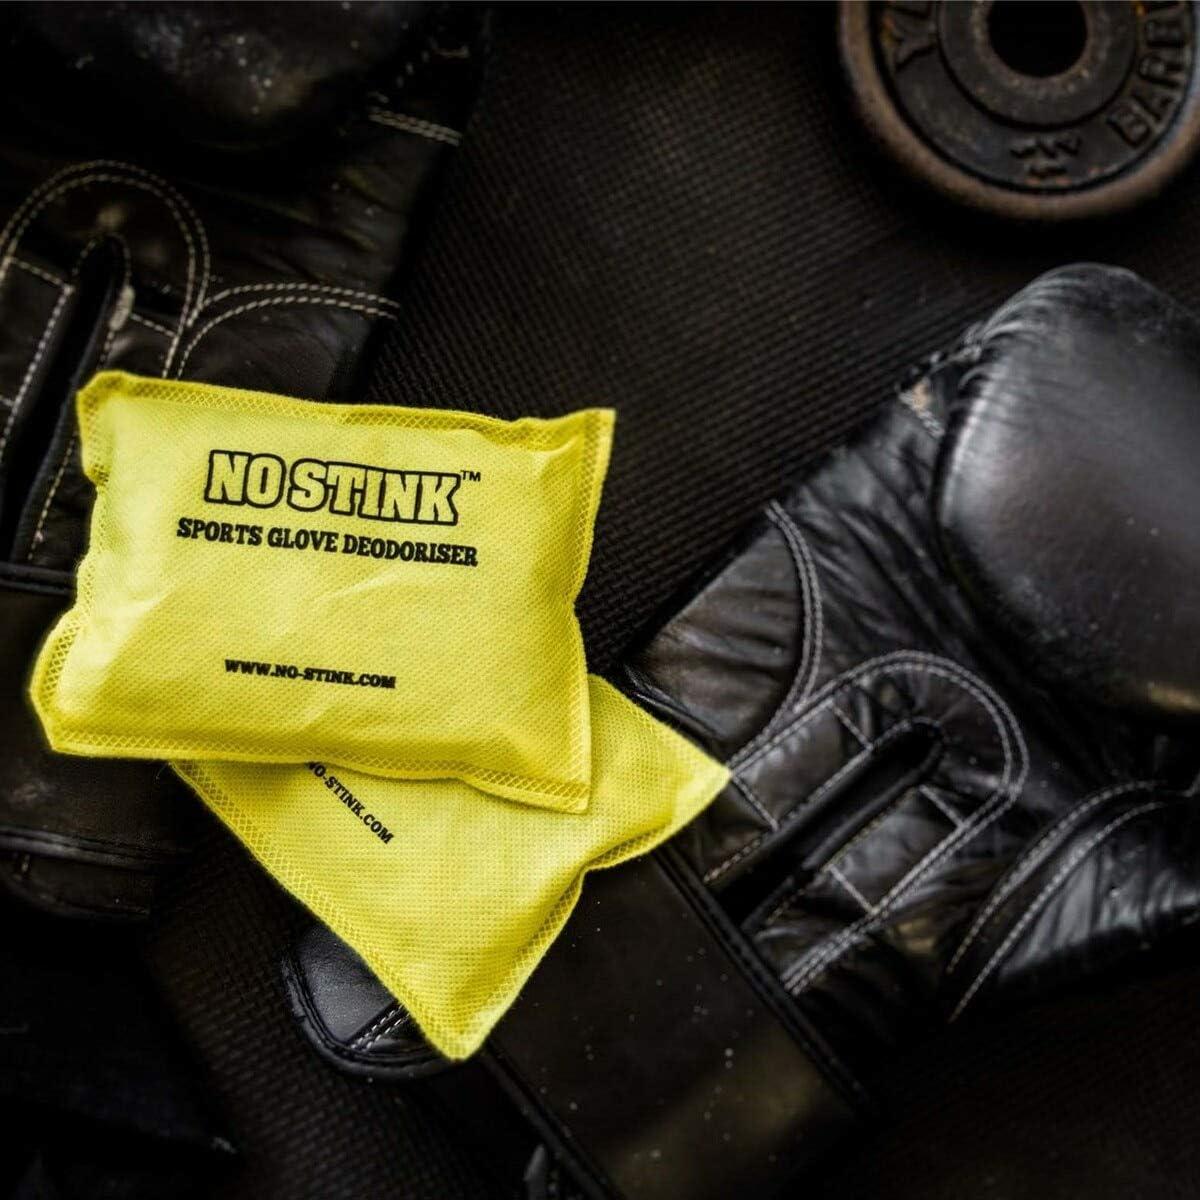 Multi-Purpose Gloves Shoes Luggage Bag No Stink Deodoriser